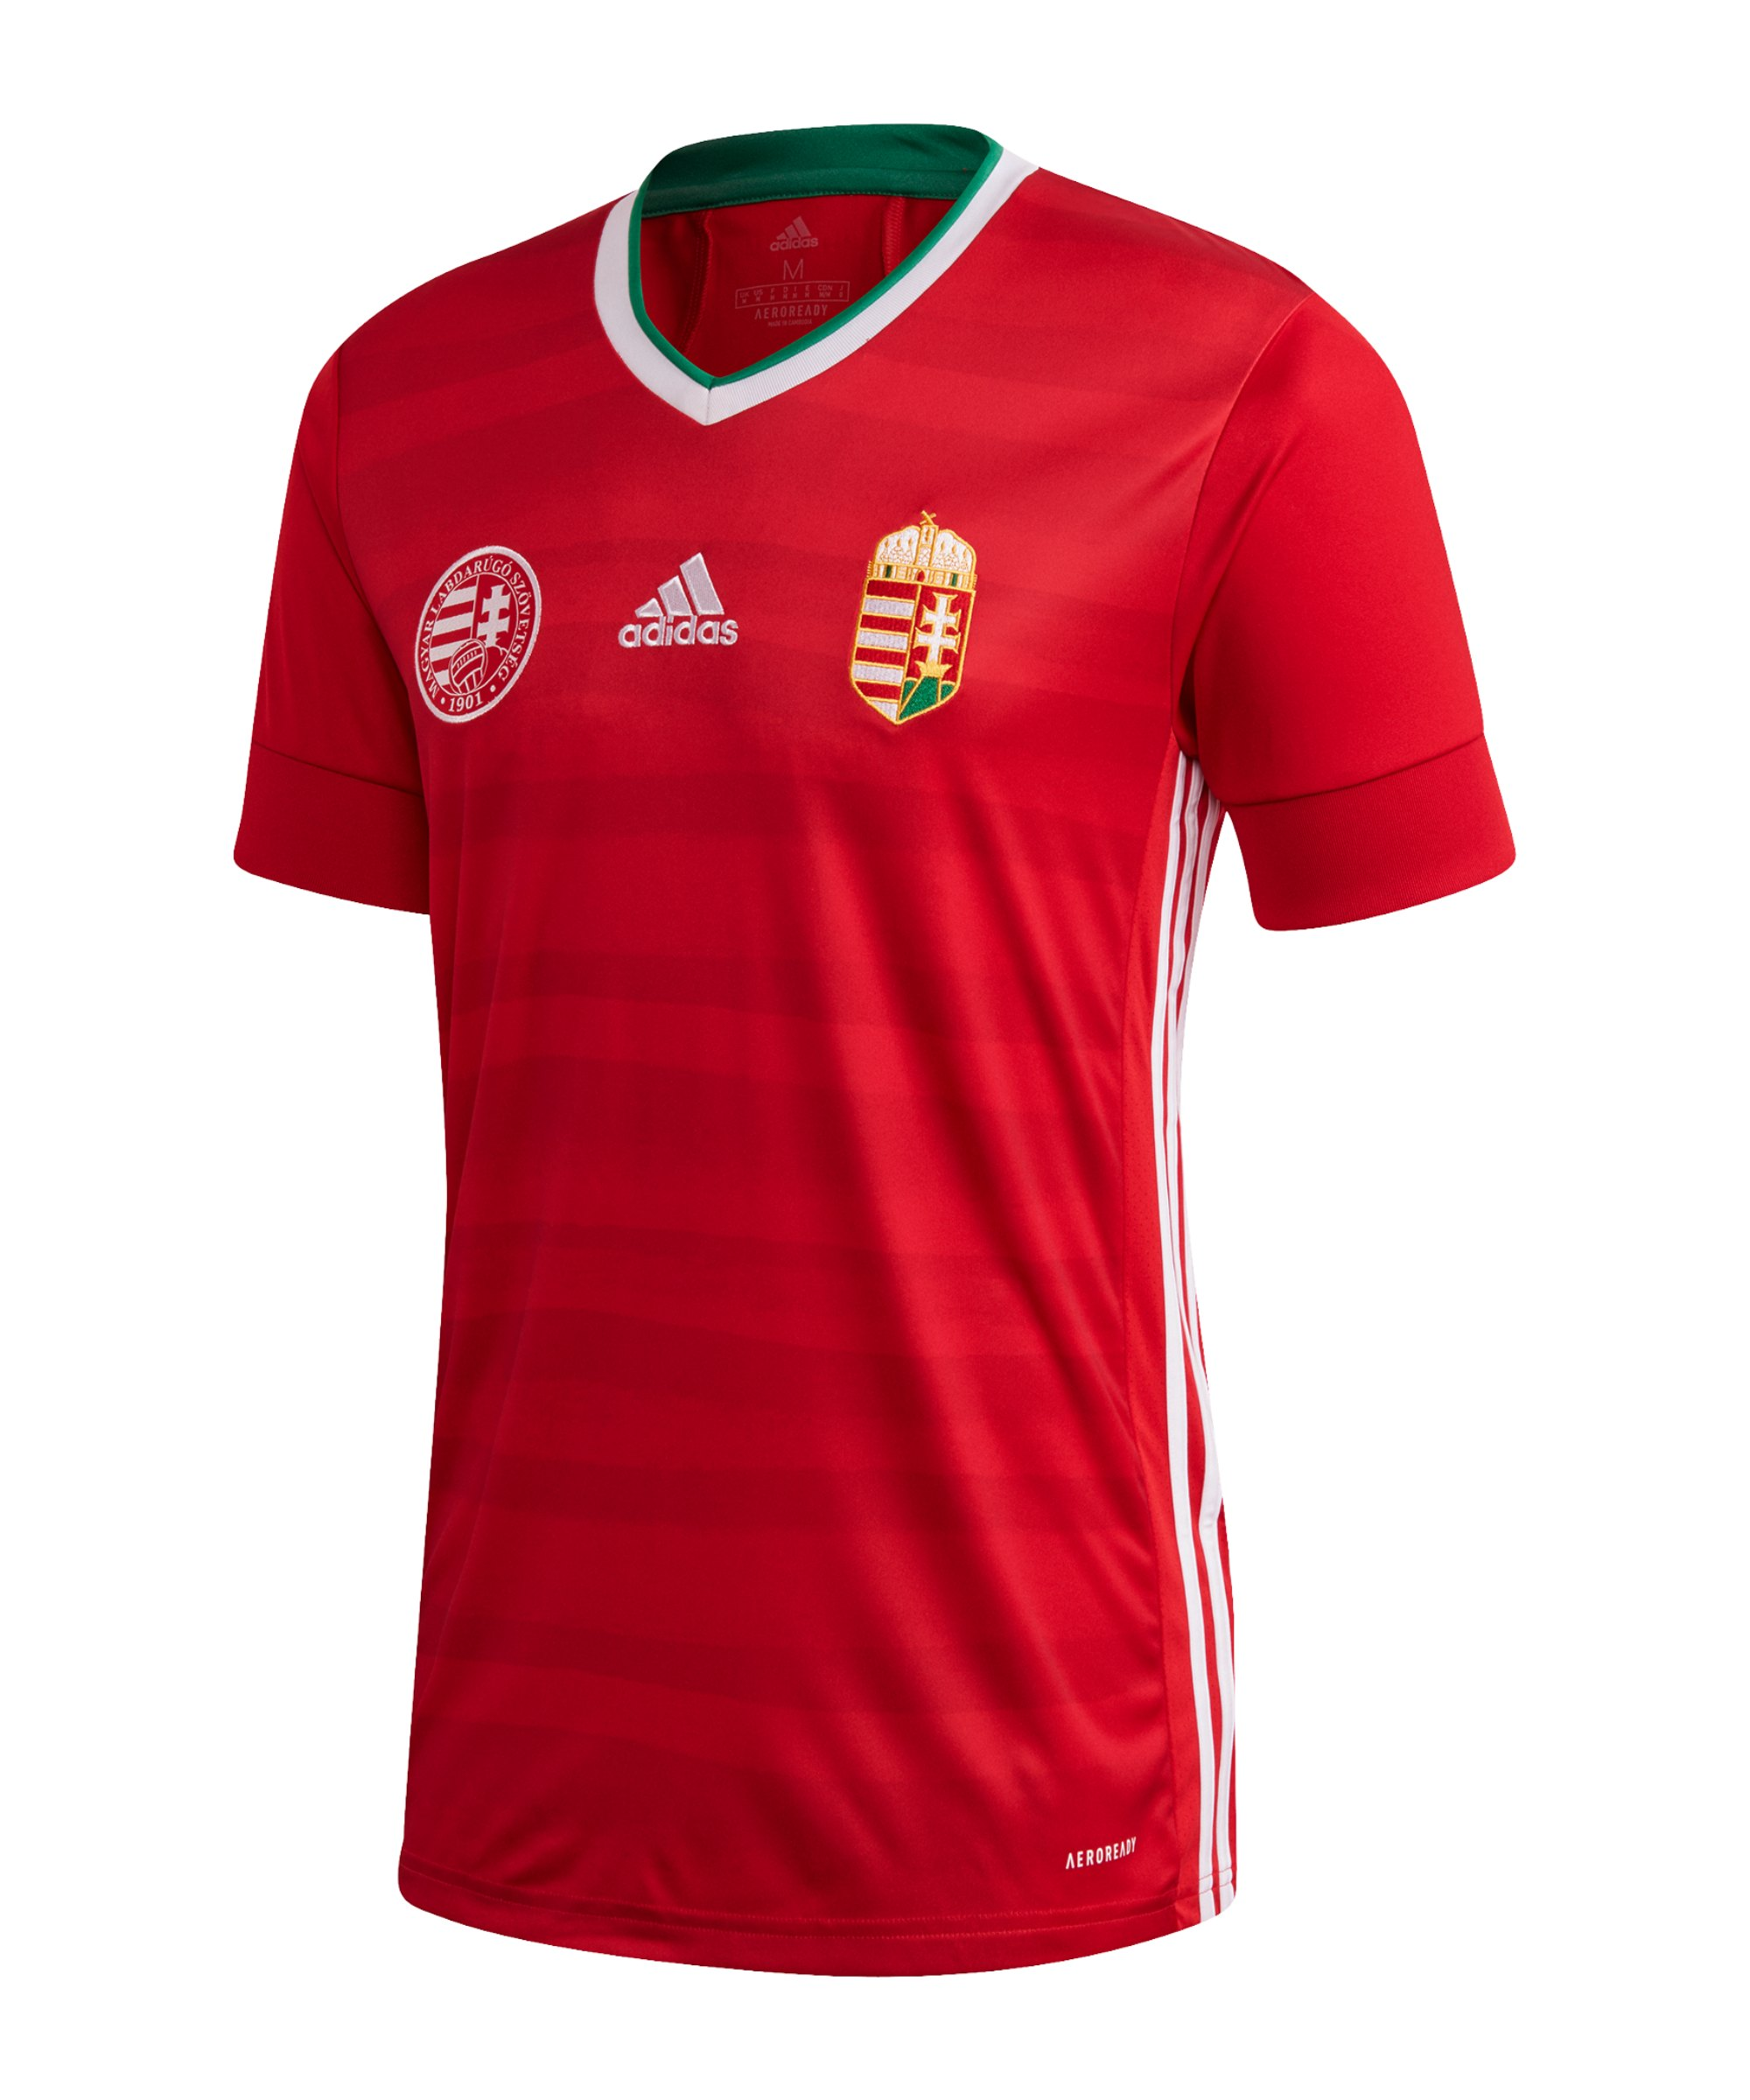 adidas Ungarn Trikot Home EM 2020 Rot - rot